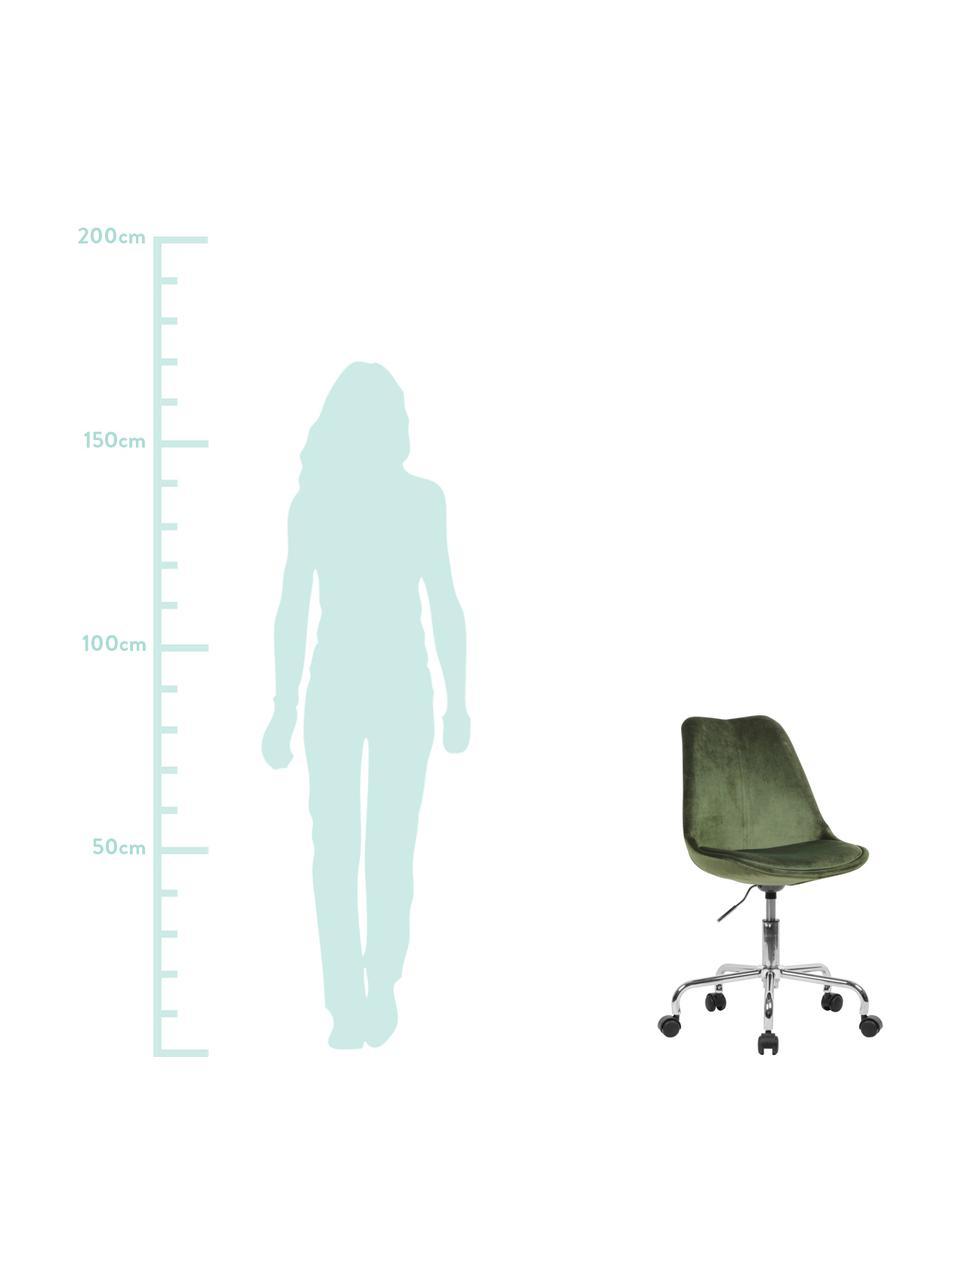 Fluwelen bureaustoel Lenka, in hoogte verstelbaar, Bekleding: fluweel, Frame: verchroomd metaal, Fluweel groen, B 65 x D 56 cm